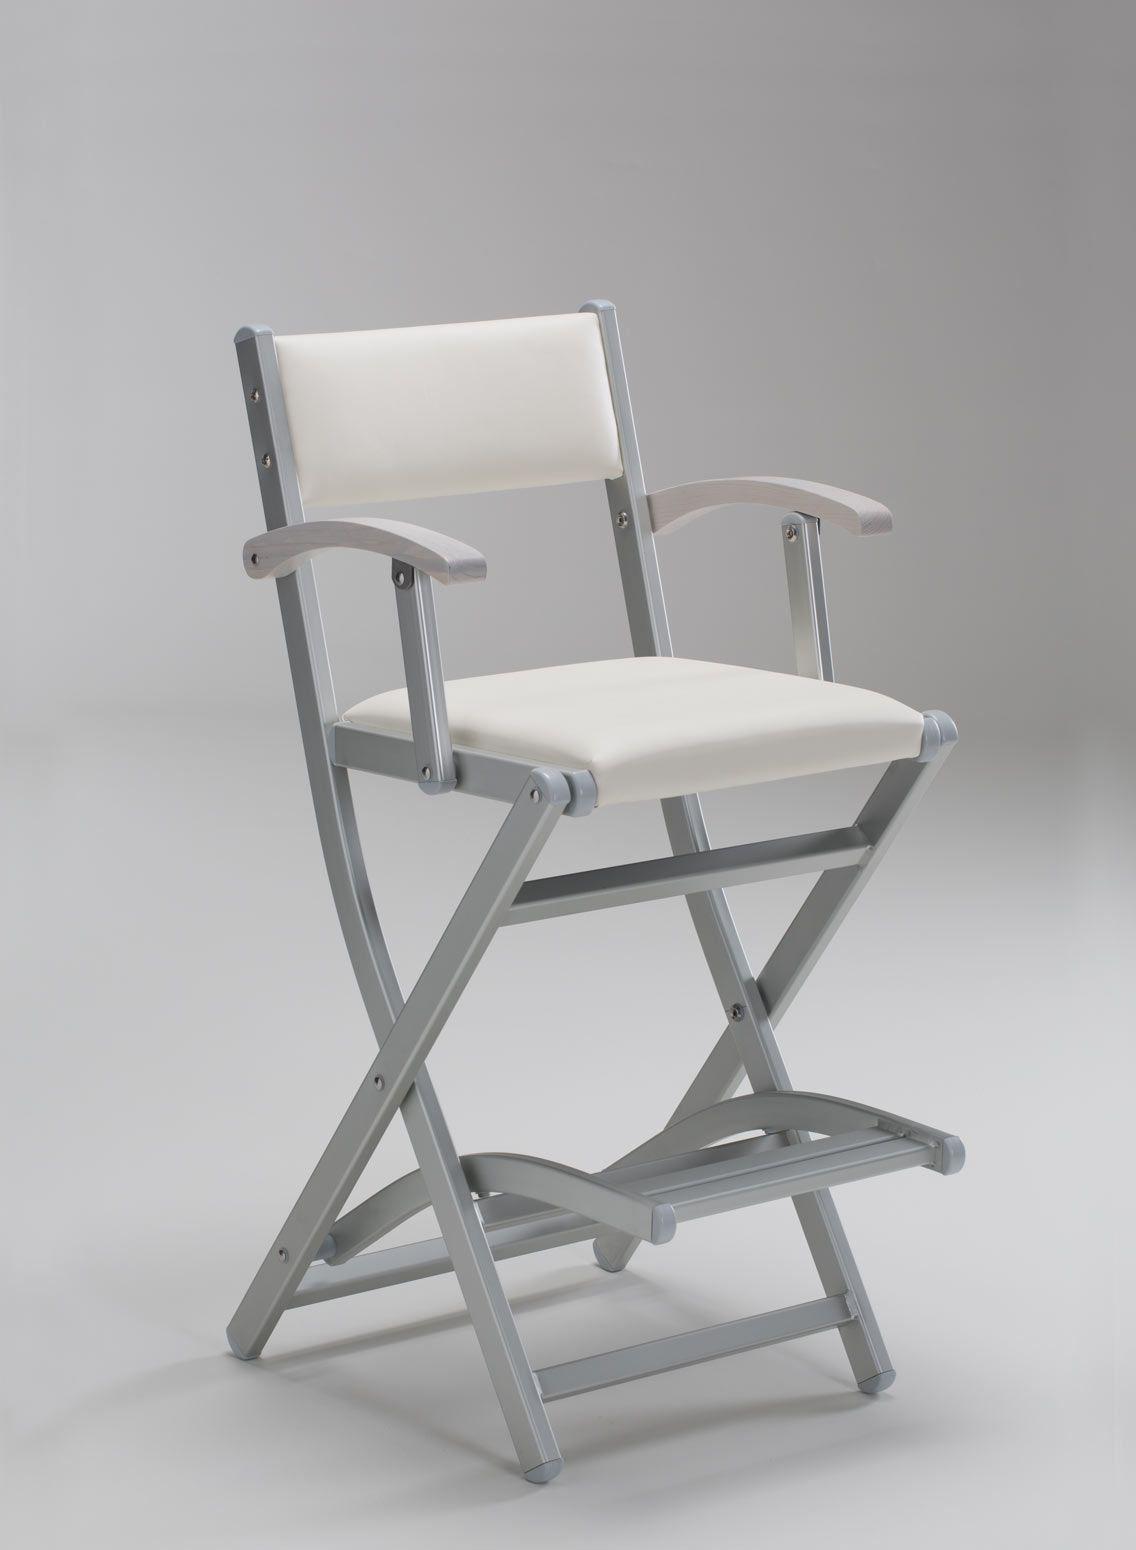 Poltrona Trucco Pieghevole In Ecopelle Makeup Chair Makeup Artist Chair Makeup Studio Decor